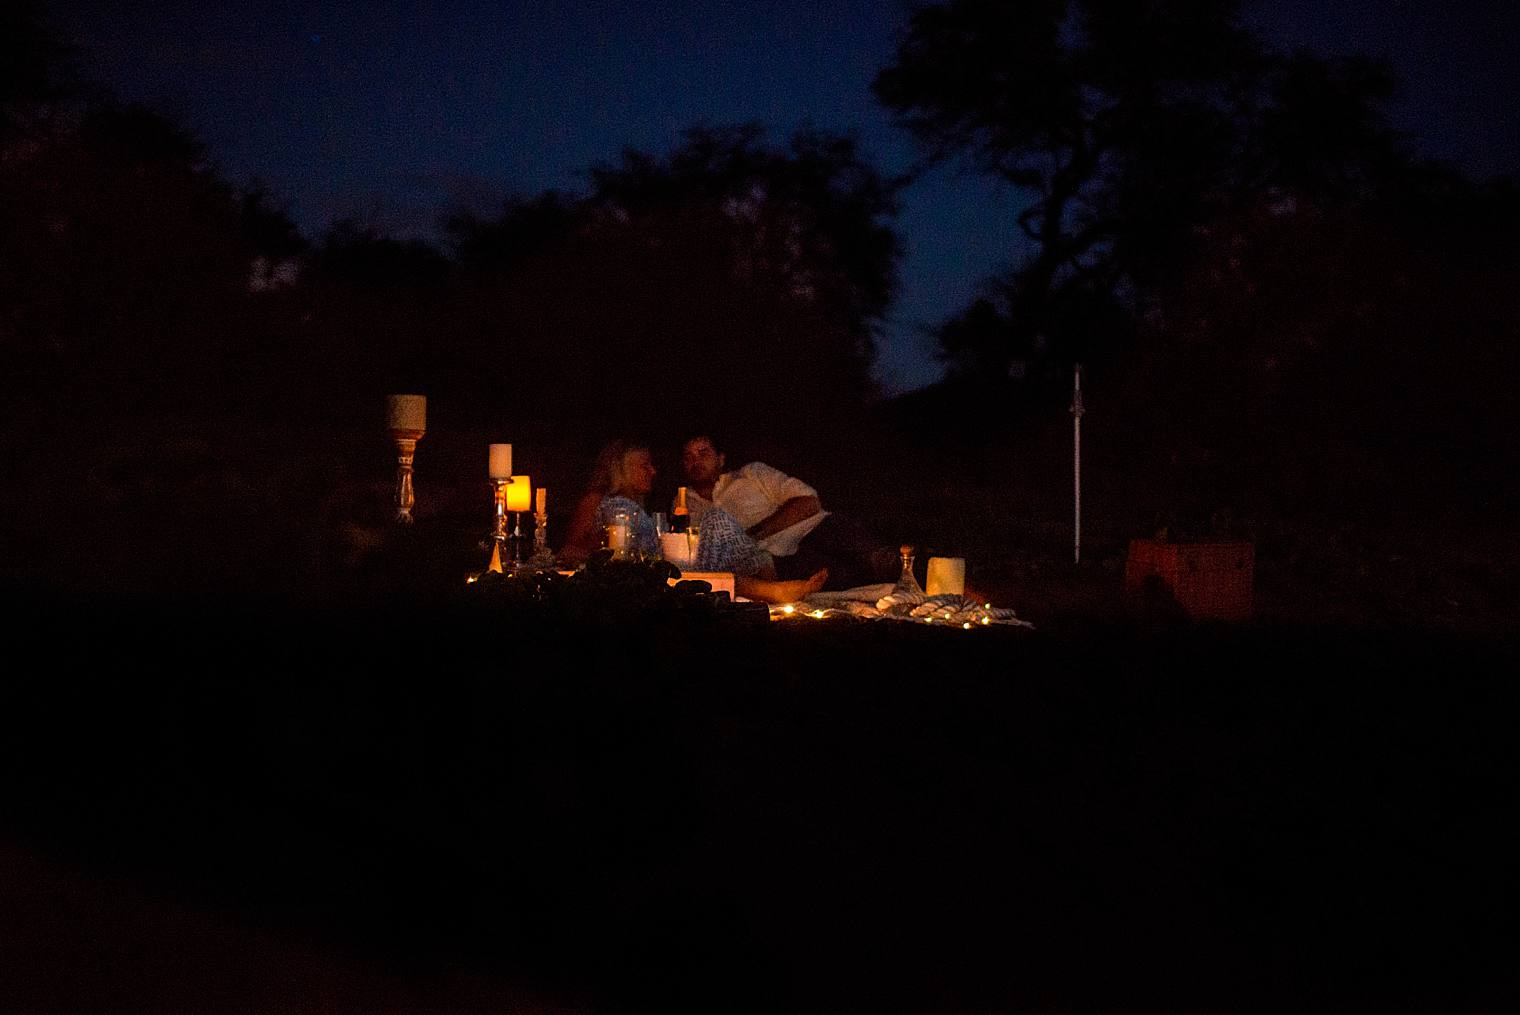 candlelit romantic picnic at night